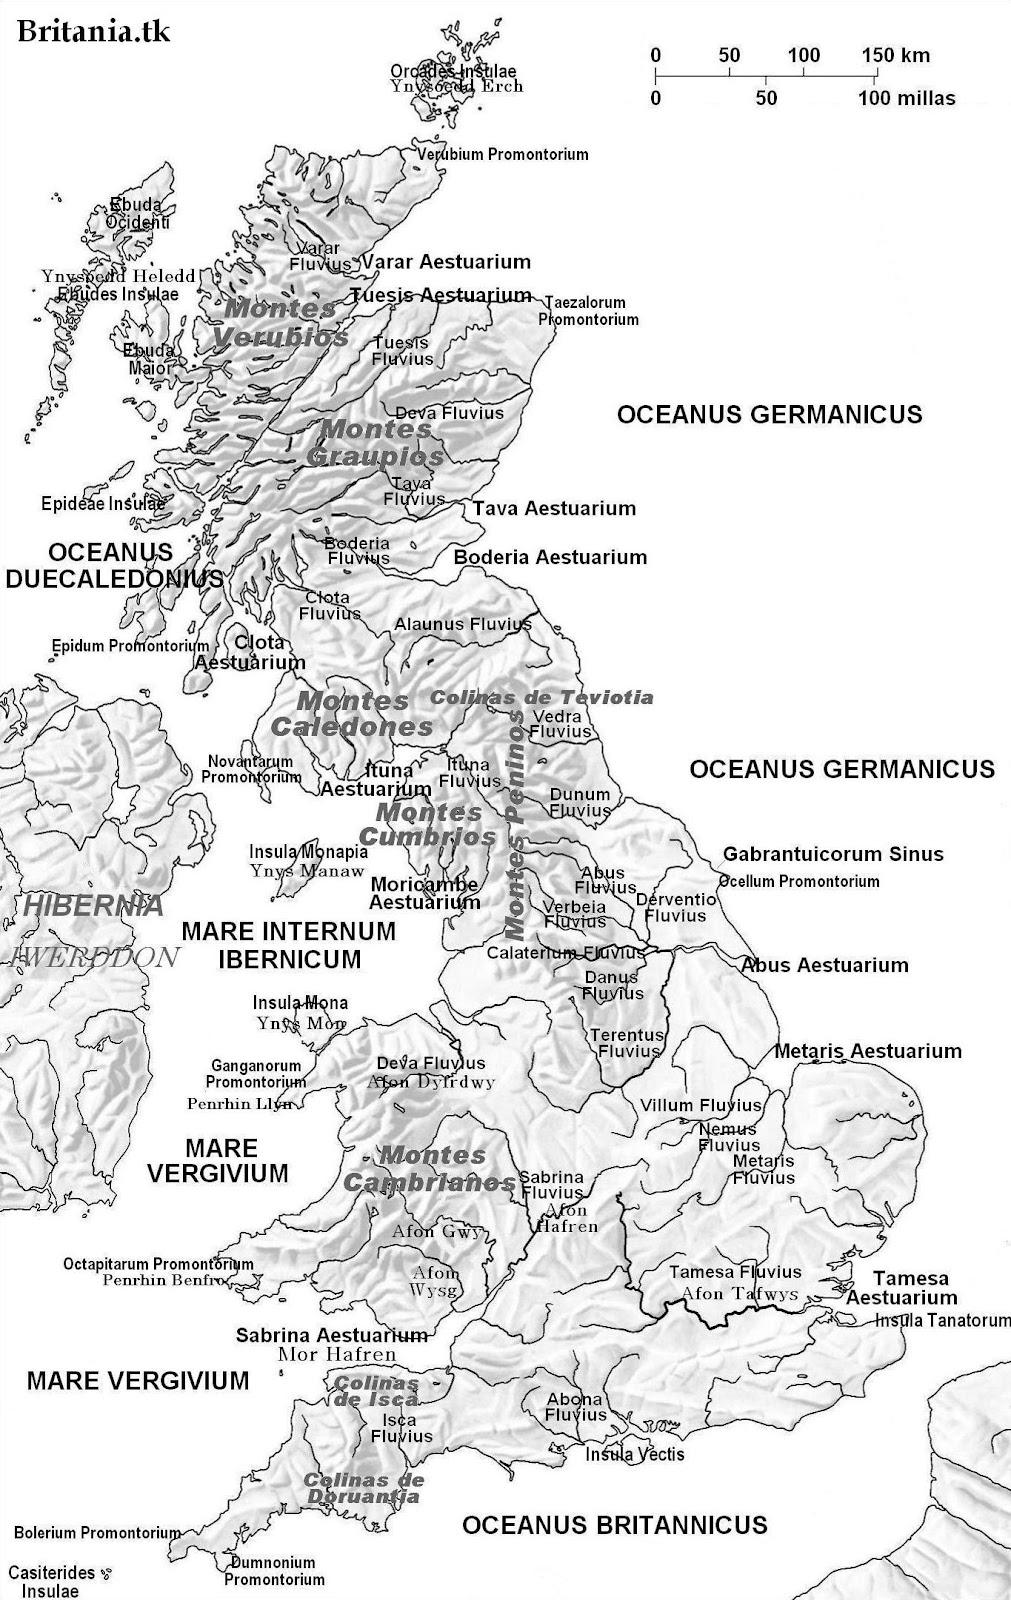 Diarios de V 2.0: Download all Maps of England, United